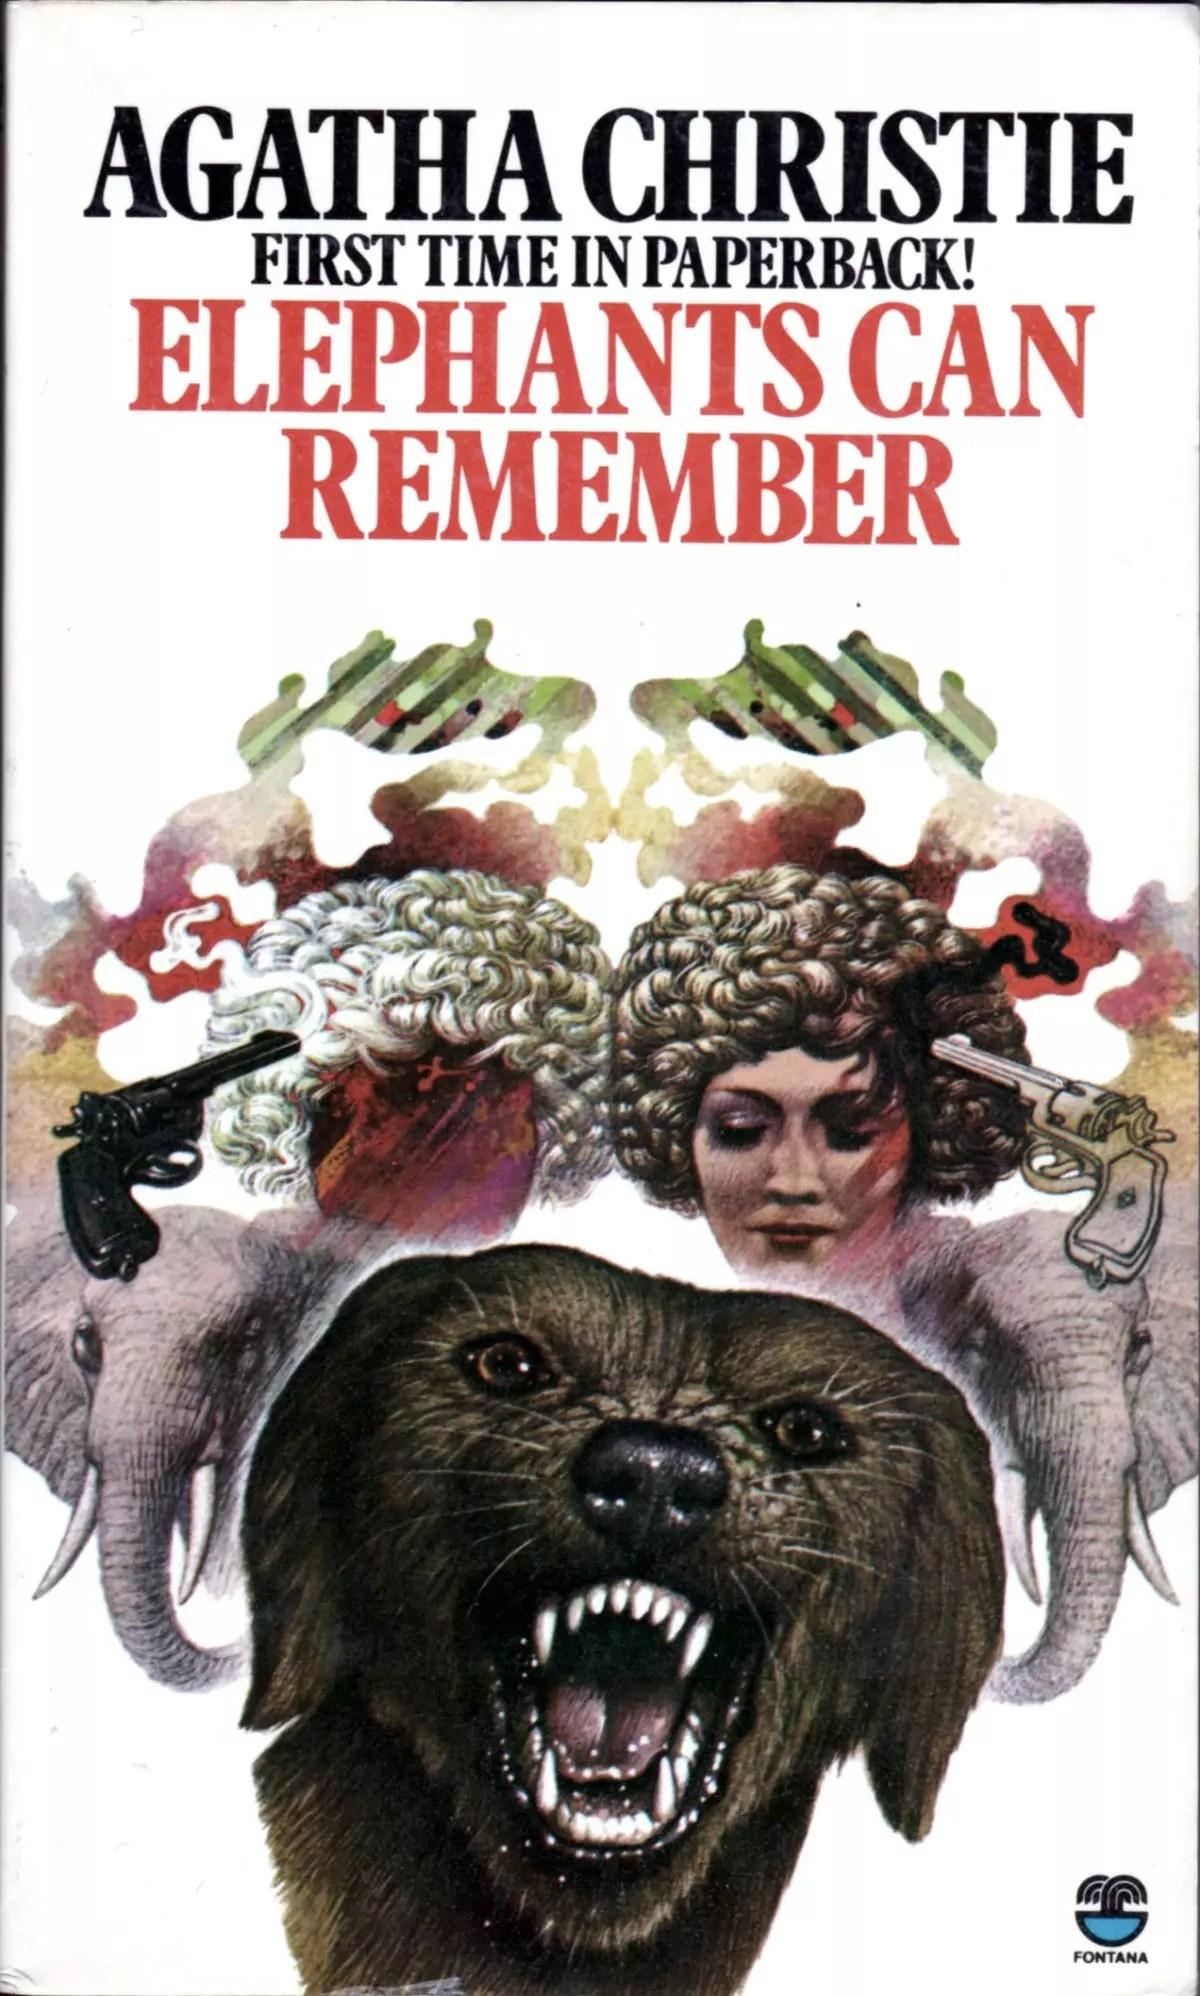 Agatha Christie Tom Adams Elephants Can Remember Fontana 1975